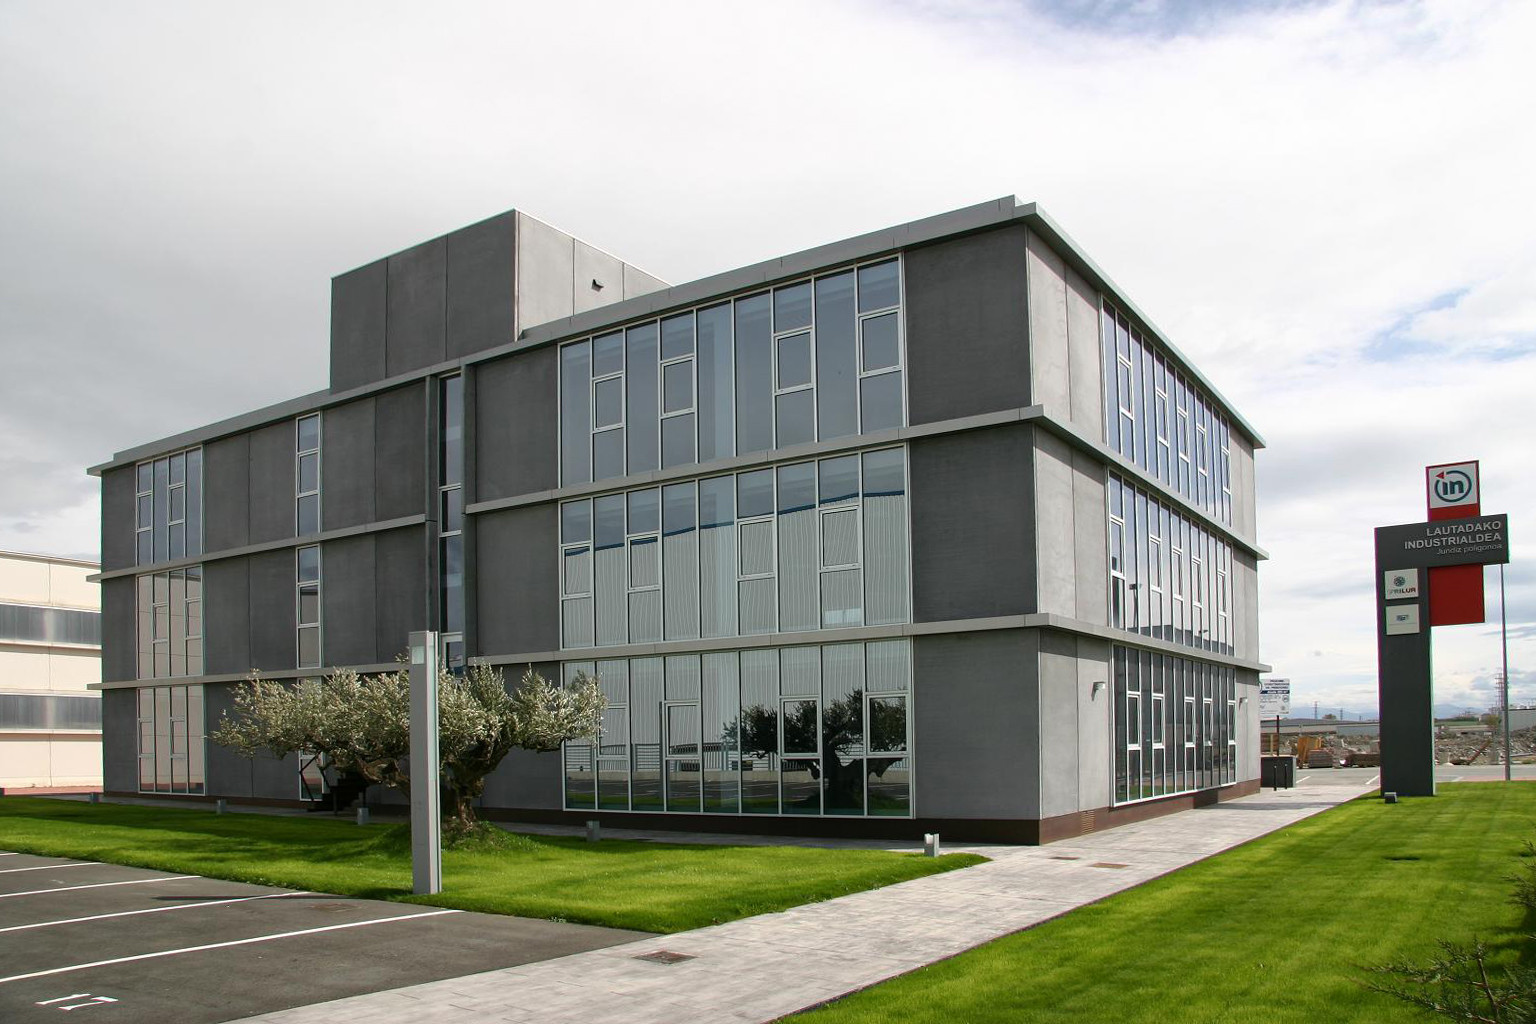 Edificio de oficinas Lautadako / Patxi Cortazar, © César San Millán